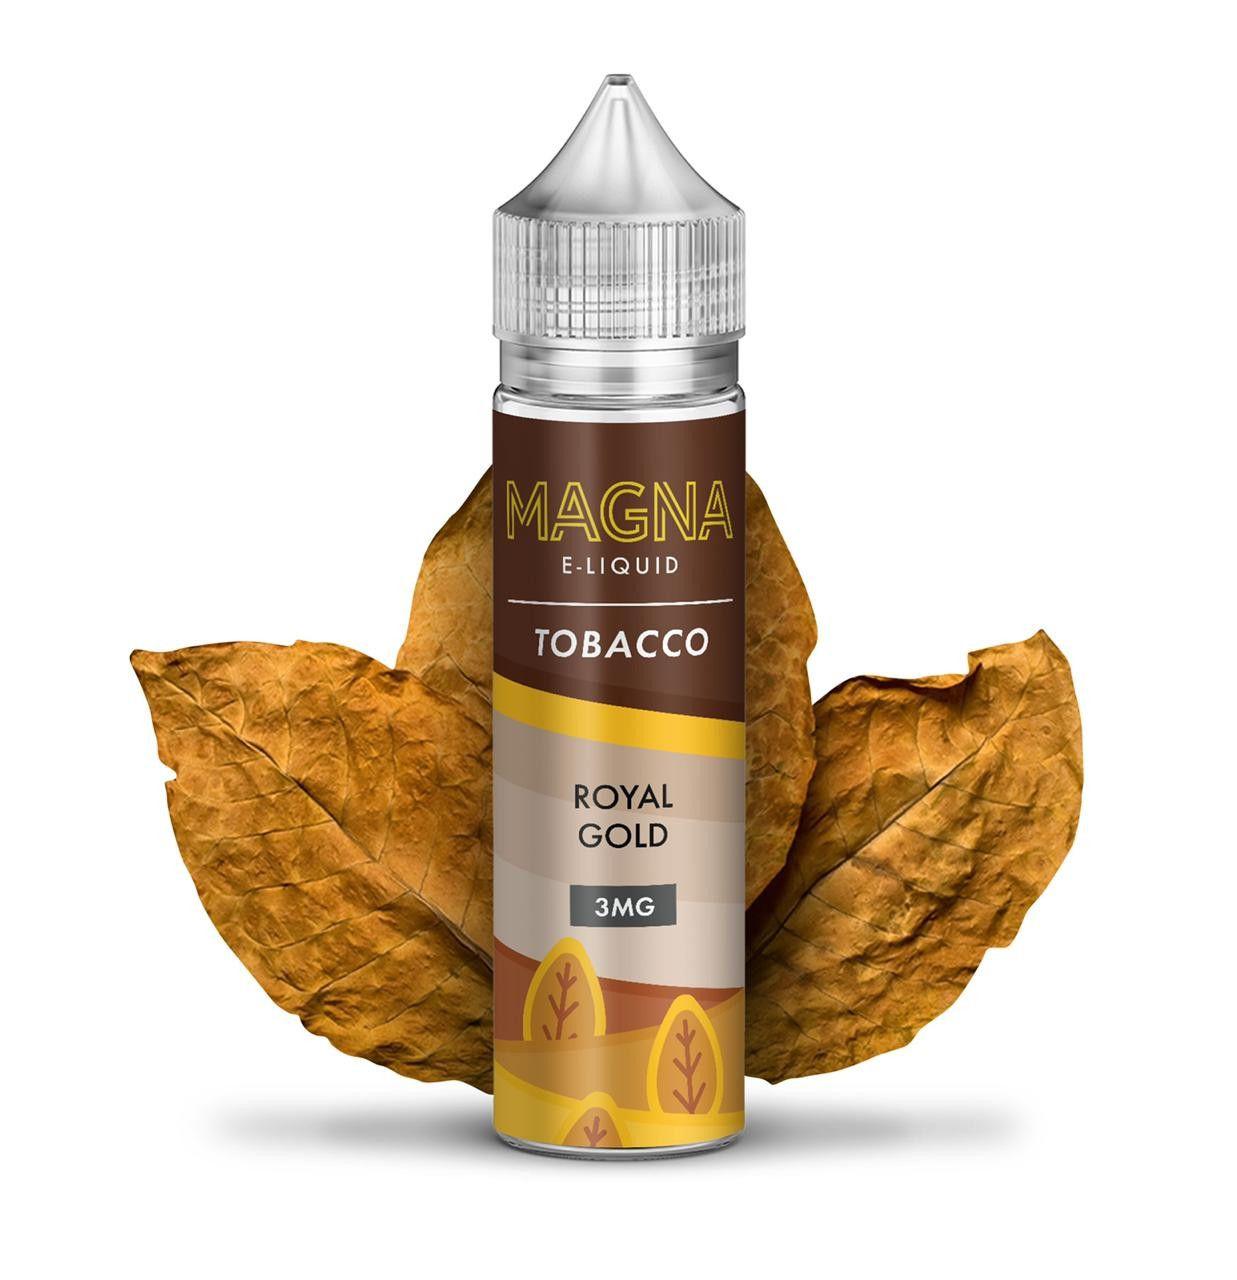 Royal Gold by Magna E-Liquid